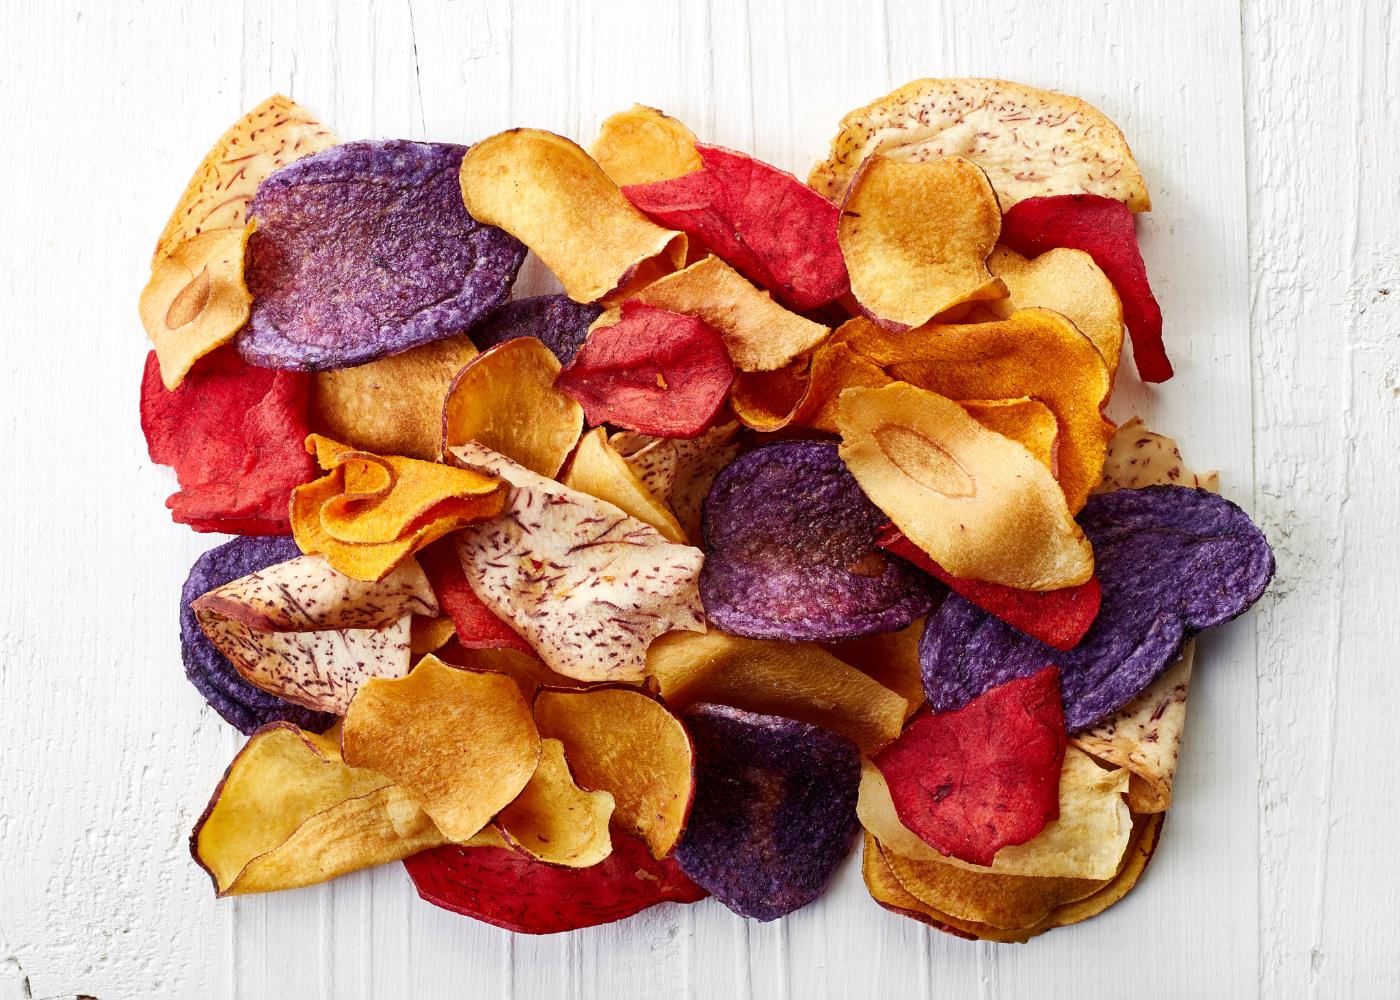 batata doce valor nutricional tipos de batata doce